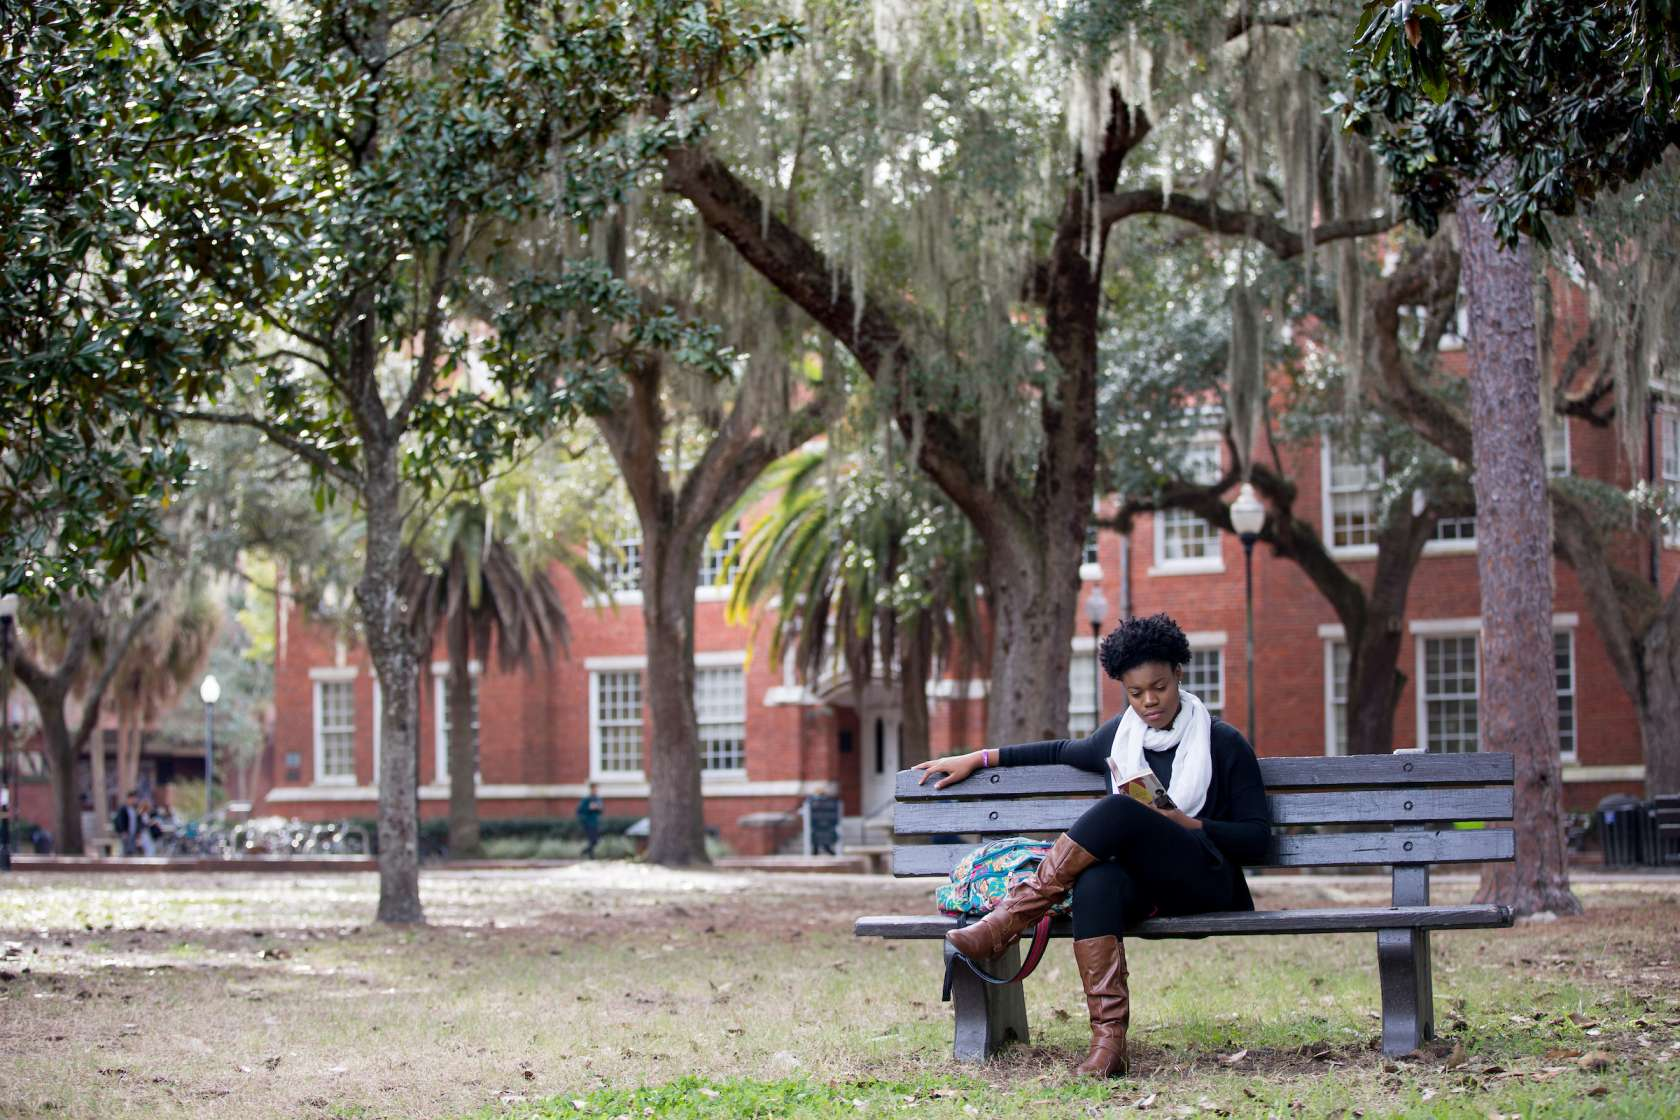 grad student opportunities